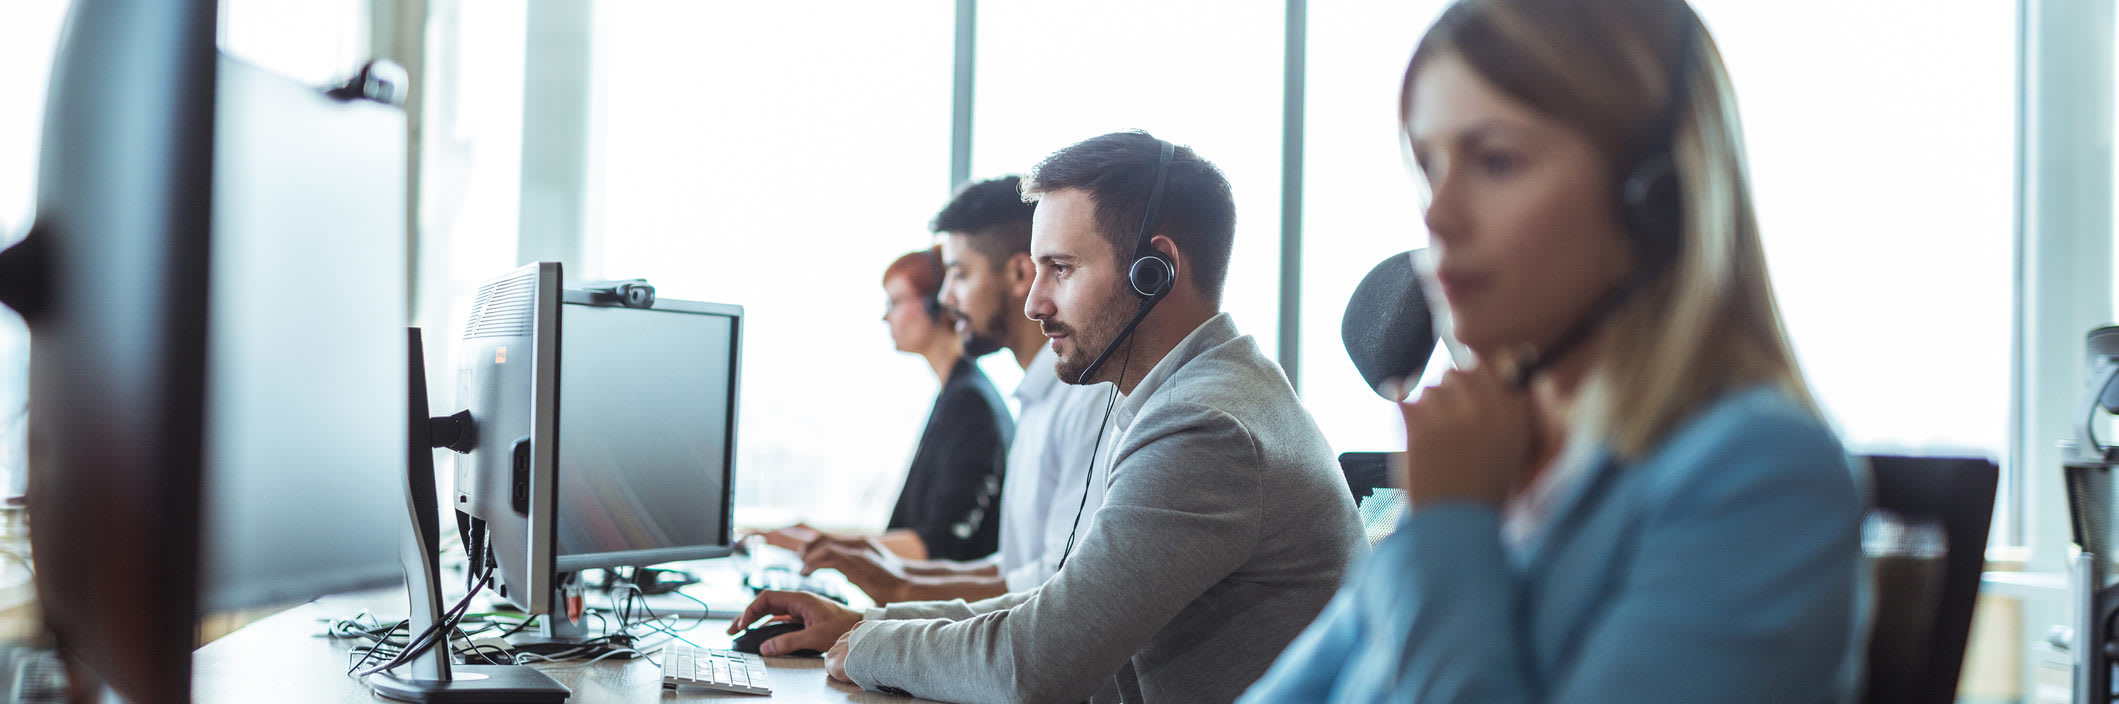 main image - Telco Service Experience Monitoring